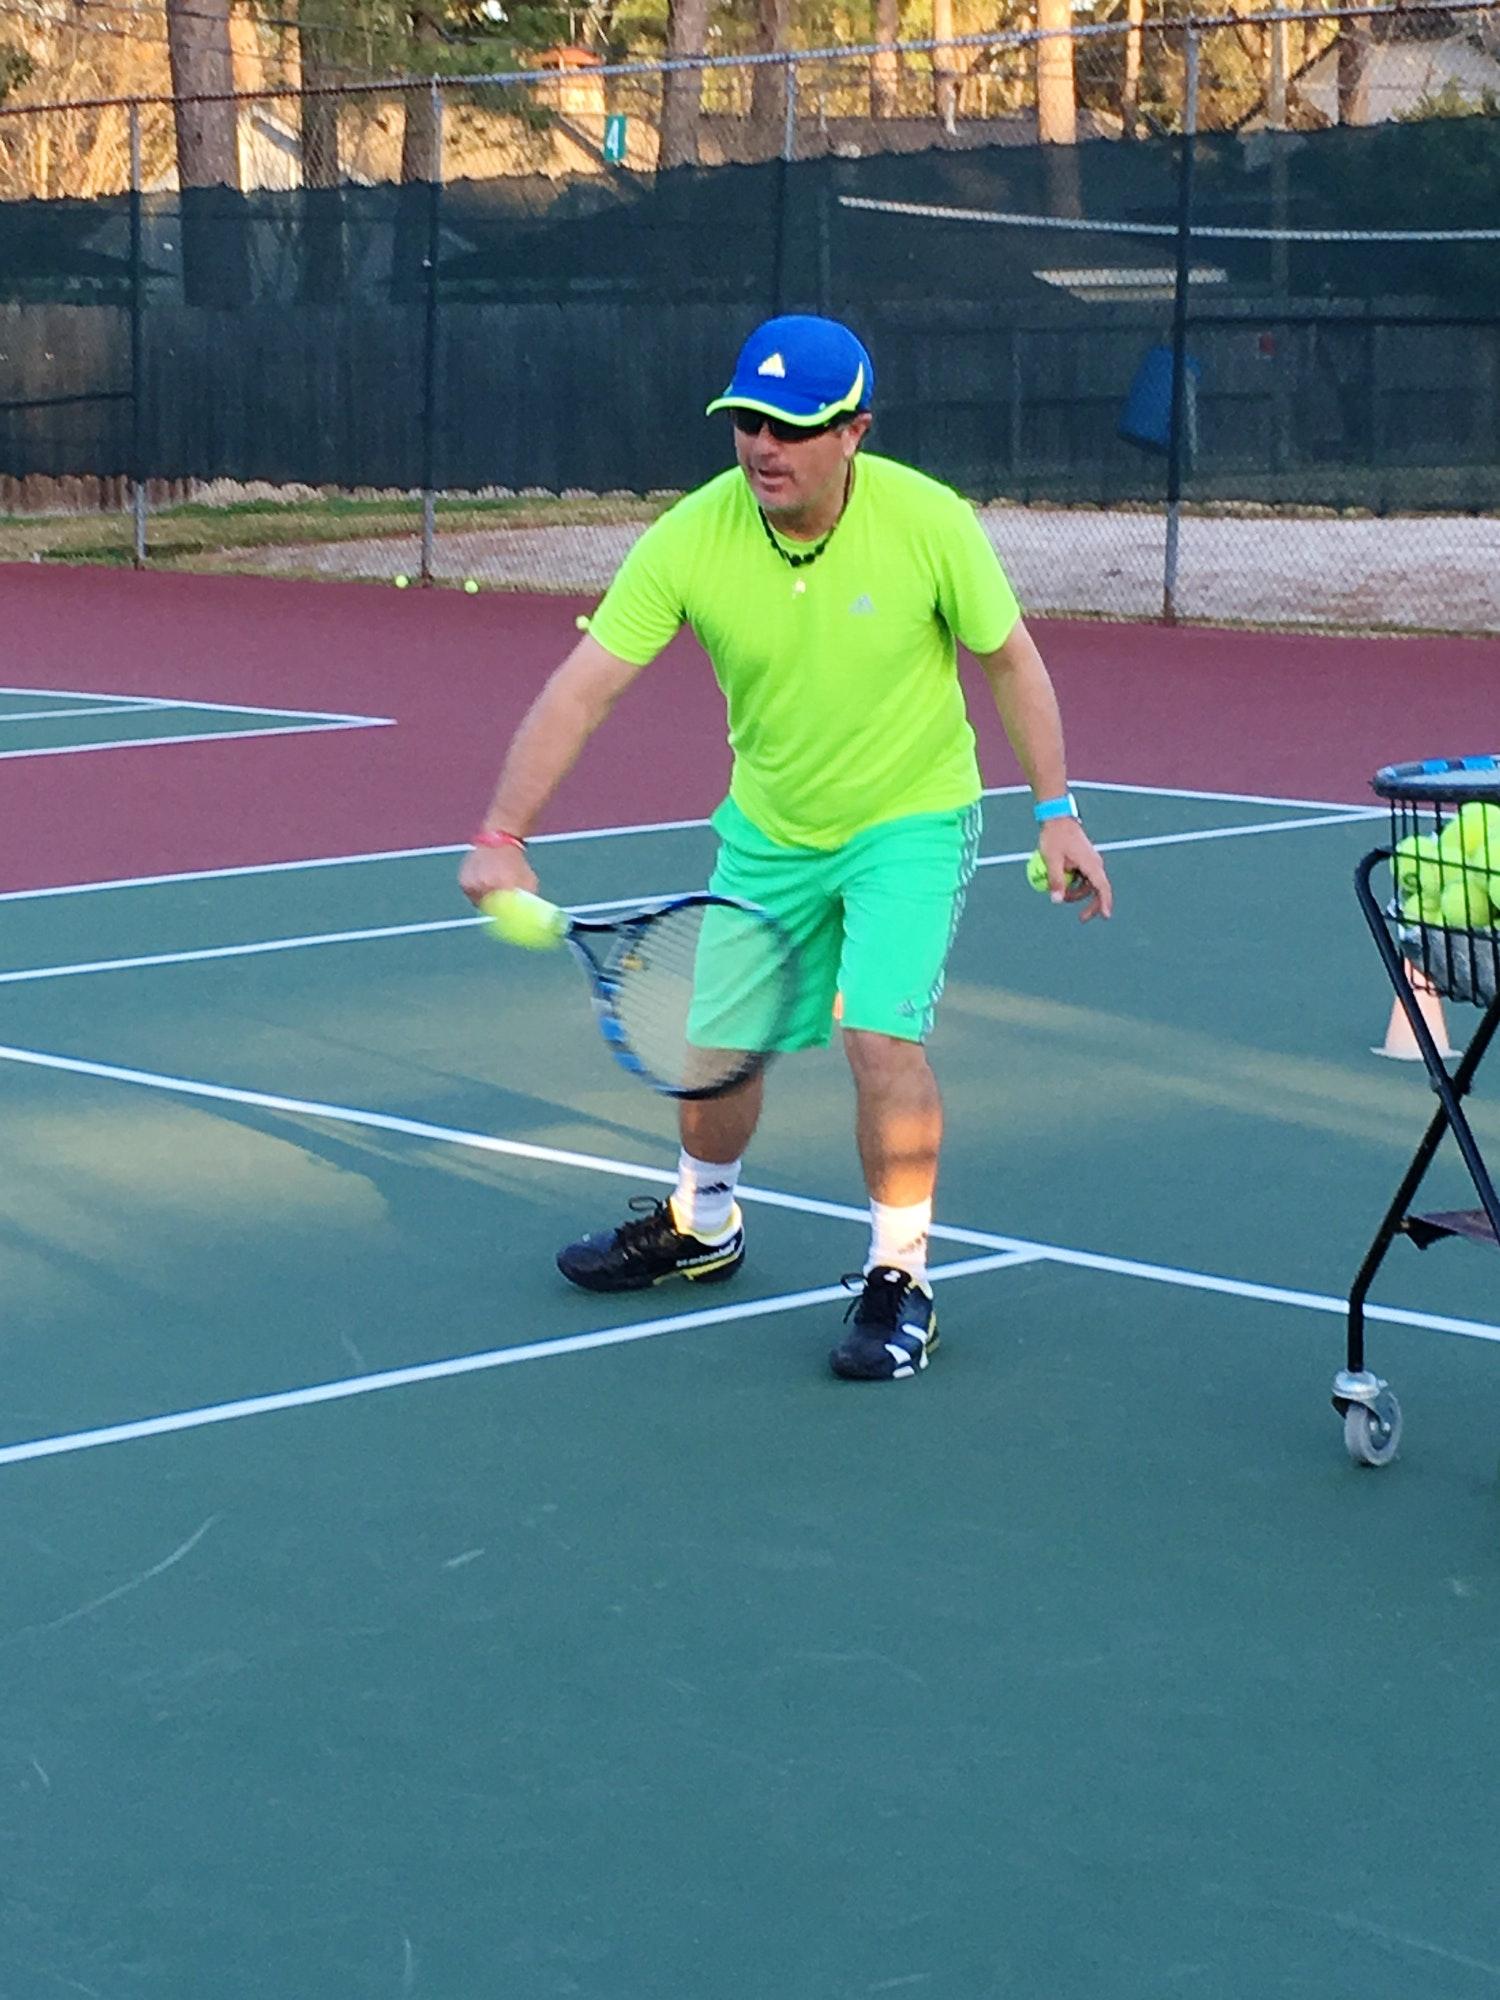 Alfredo R. teaches tennis lessons in Houston, TX